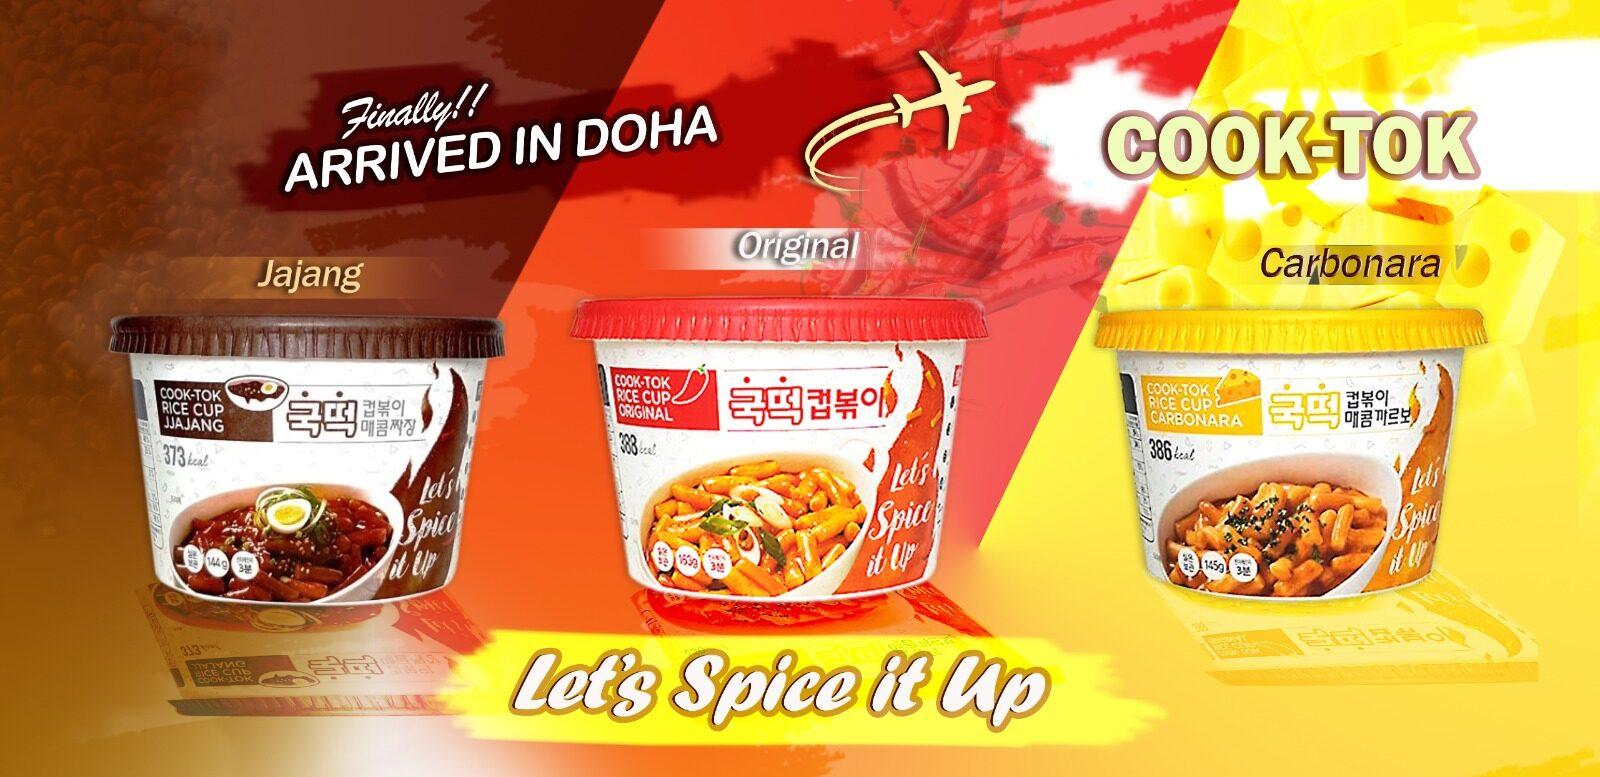 Cook-Tok Rice Cup